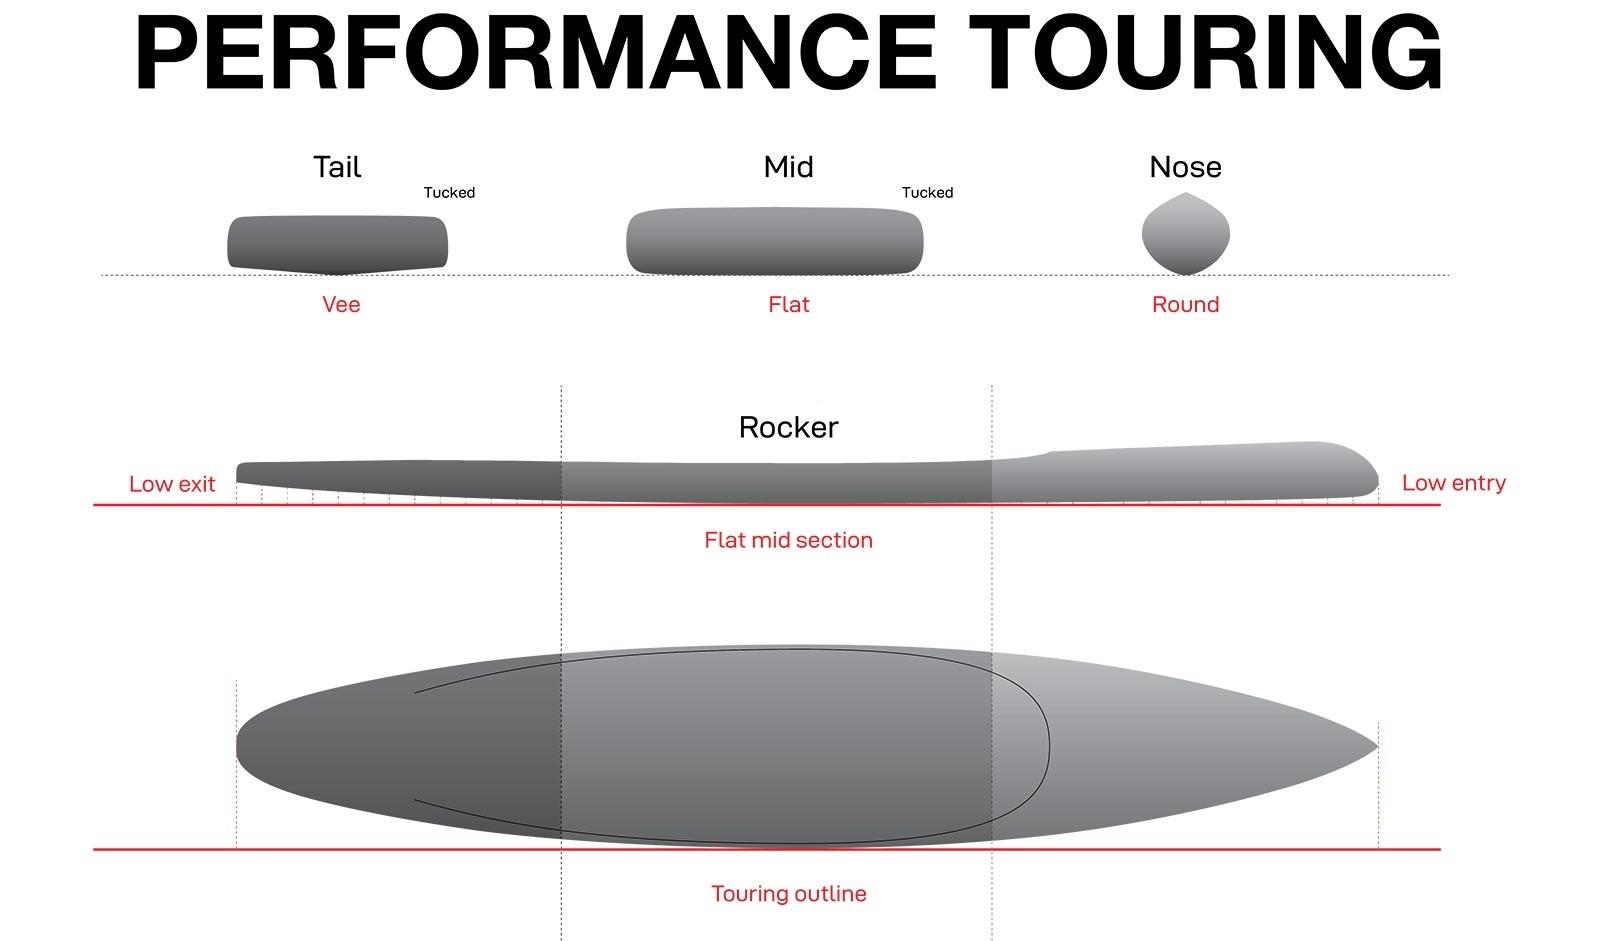 NSP Performance Touring Profile